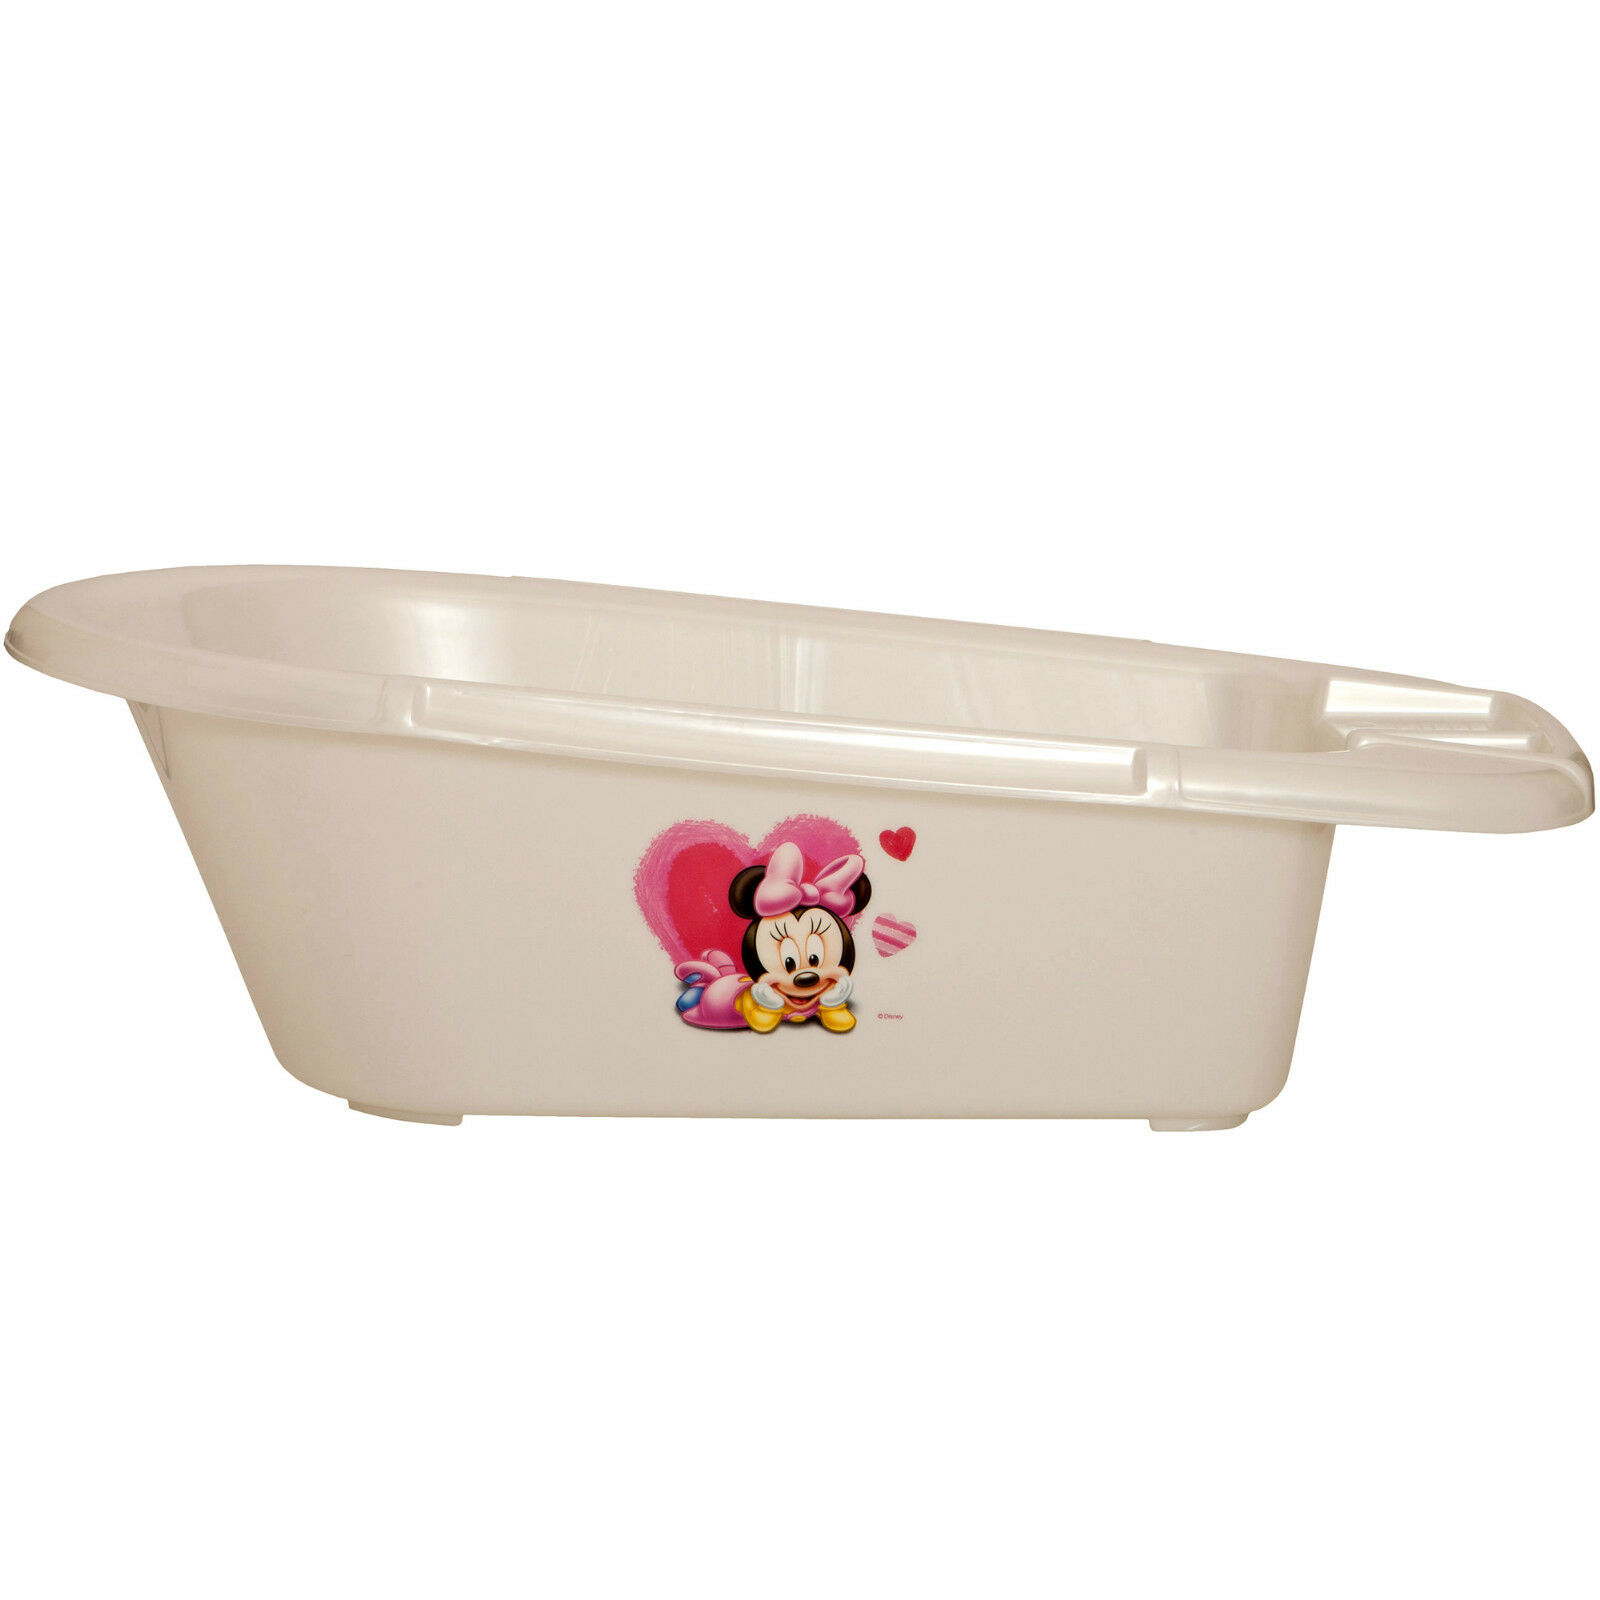 minnie mouse baby bath tub for newborn 12 months anti slip 0 3 6 rrp 25. Black Bedroom Furniture Sets. Home Design Ideas